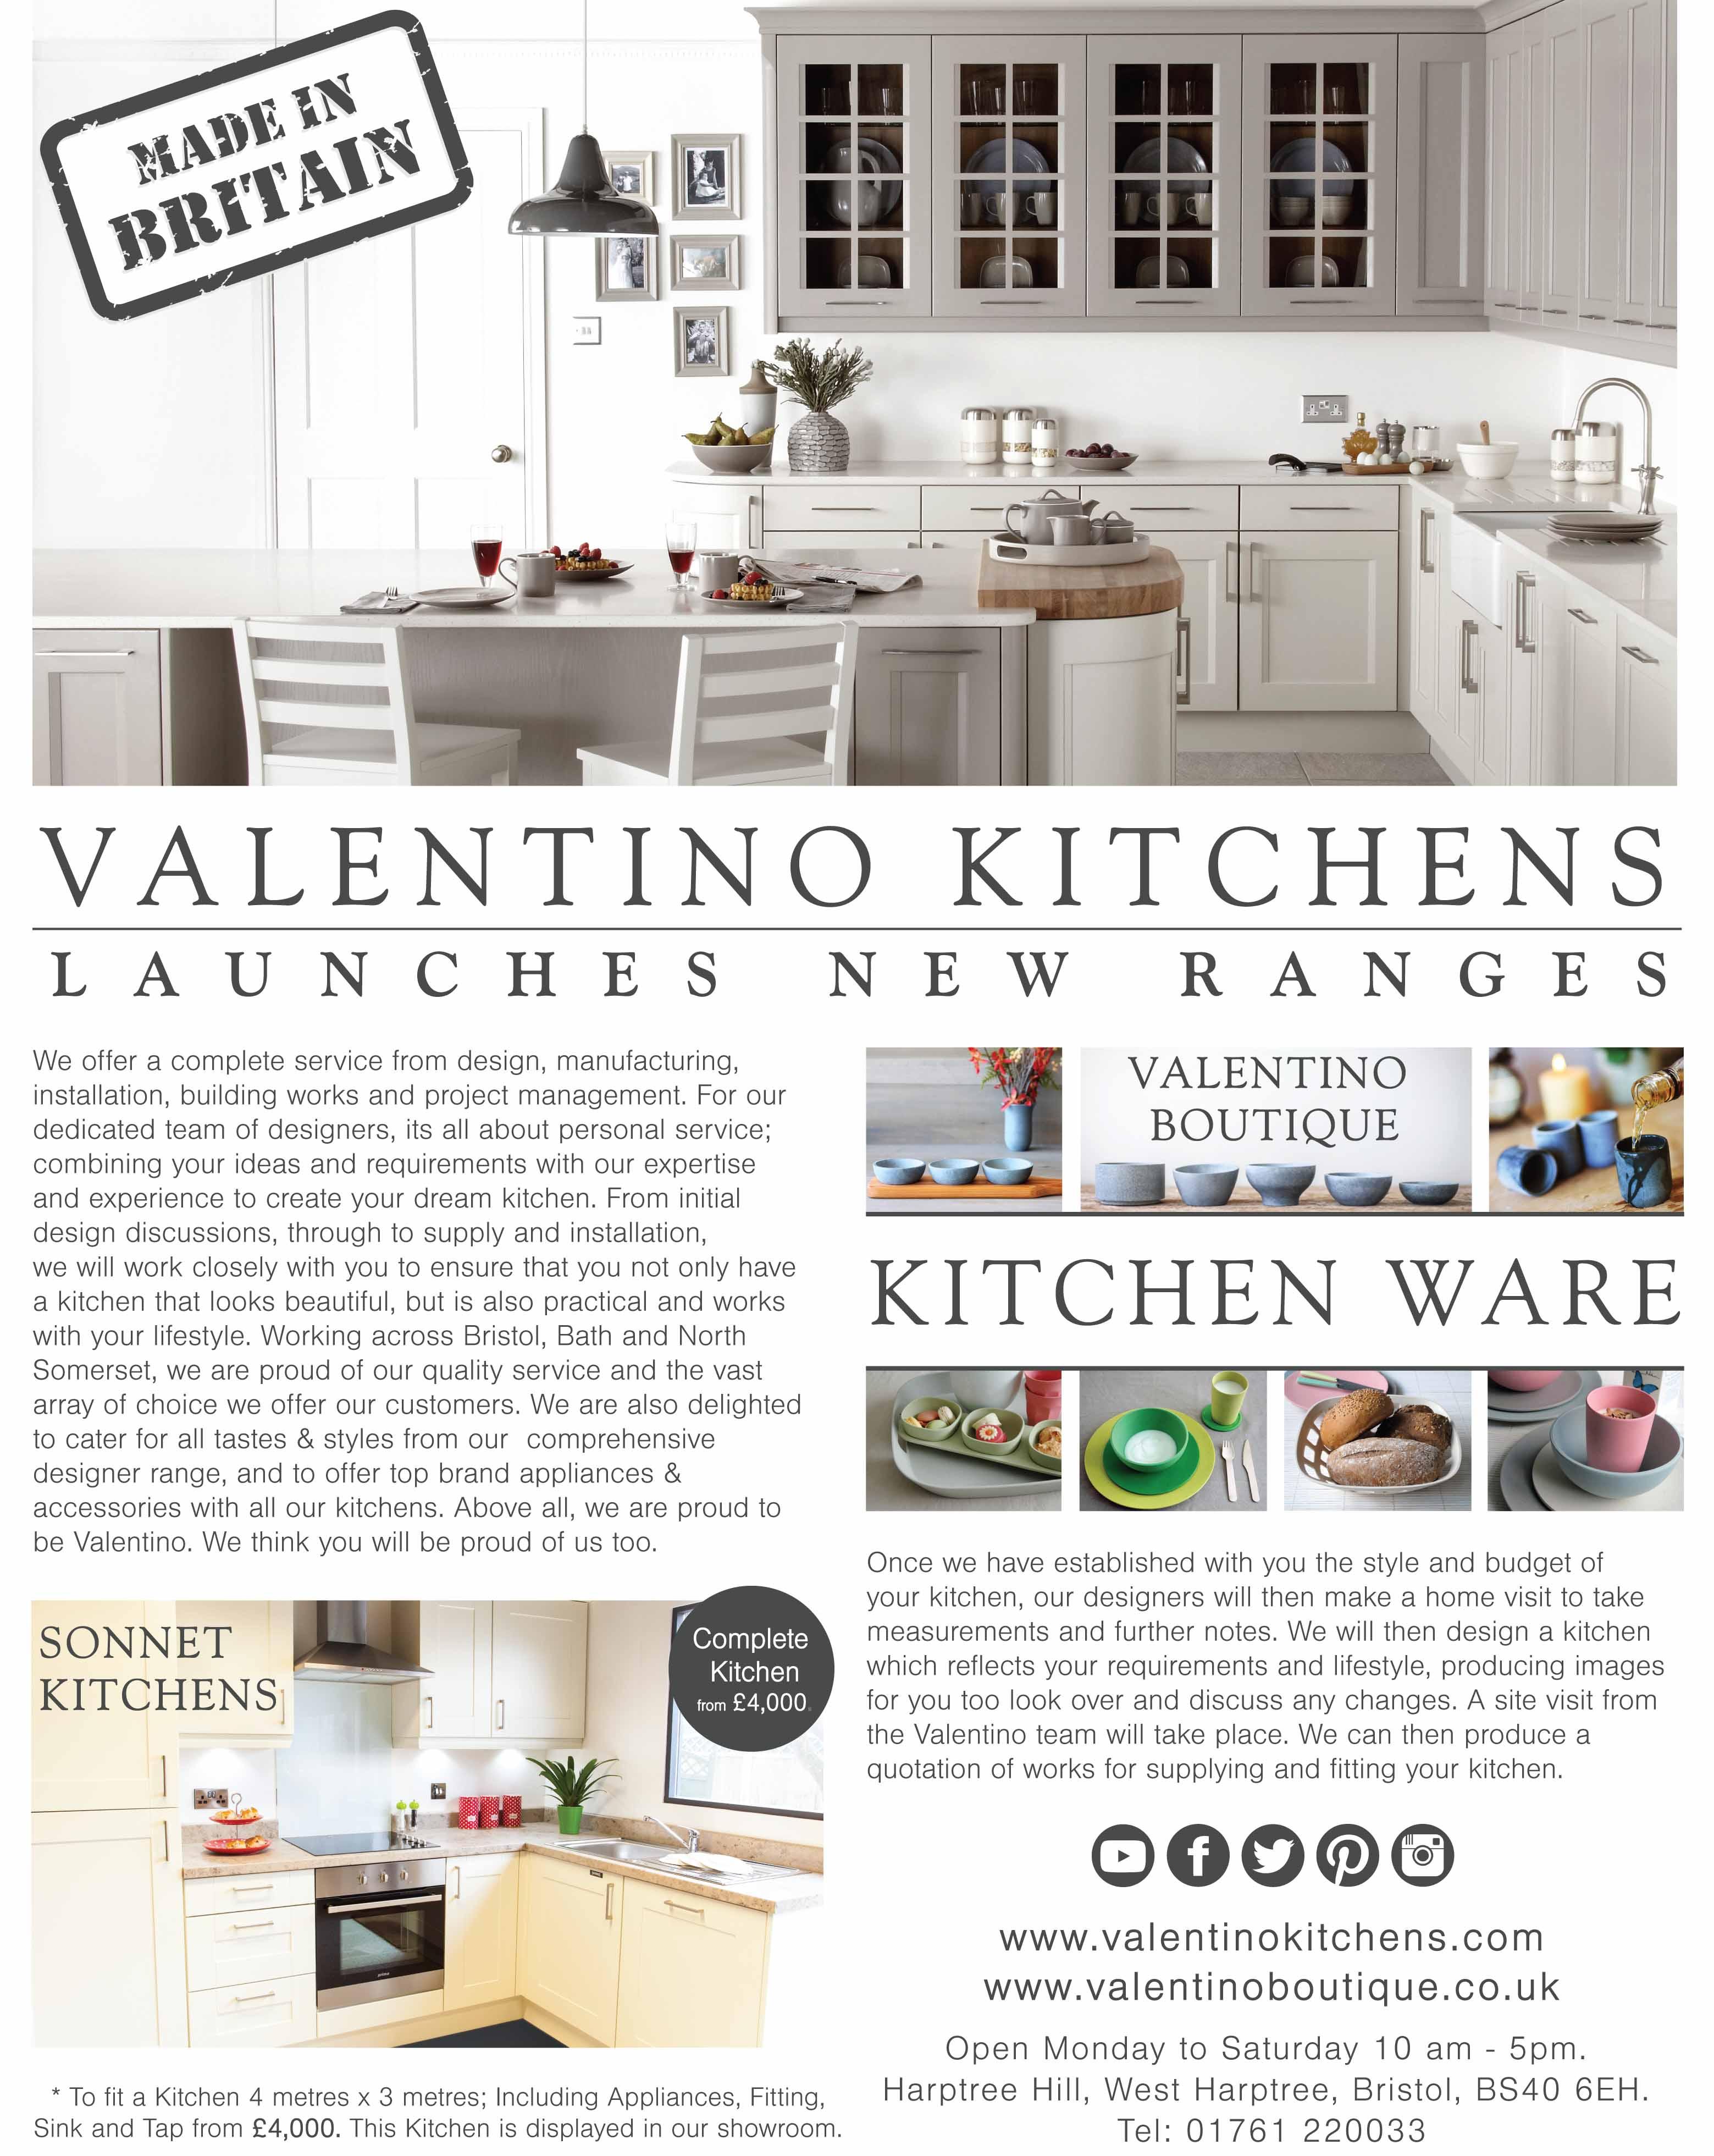 Valentino Ad May 2015-update copy